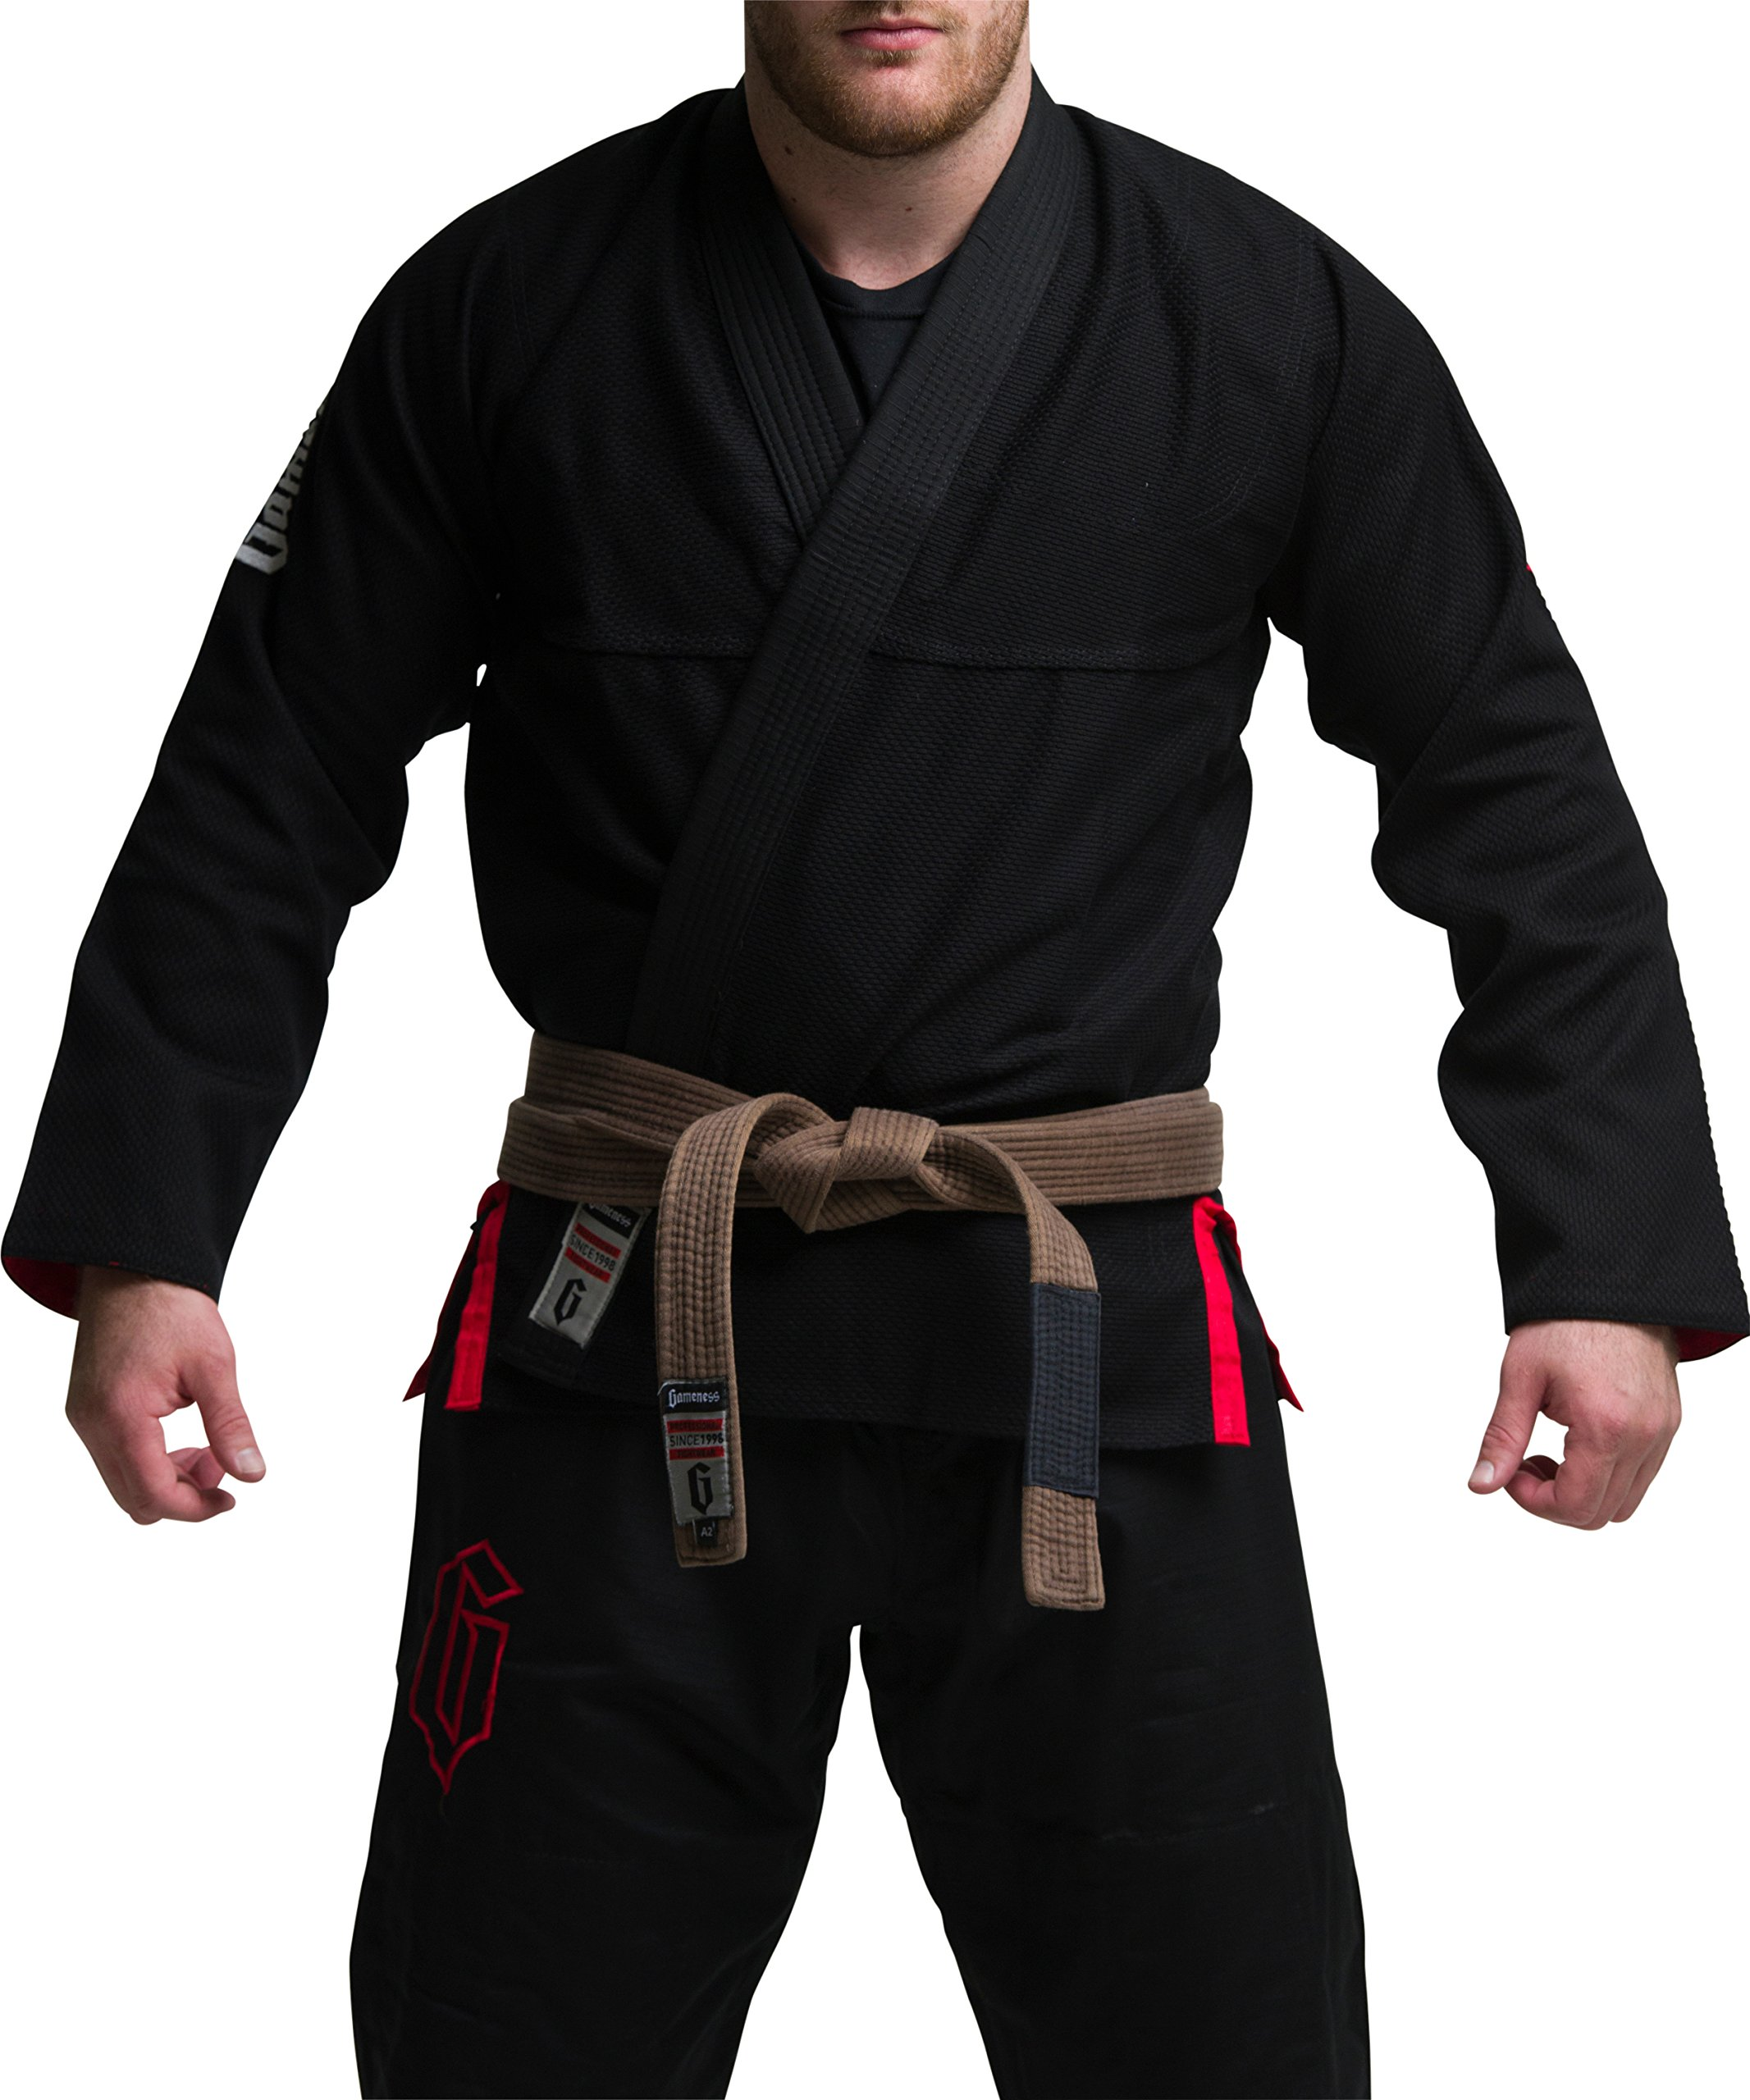 Gameness Jiu Jitsu Air Gi Black A1 by Gameness